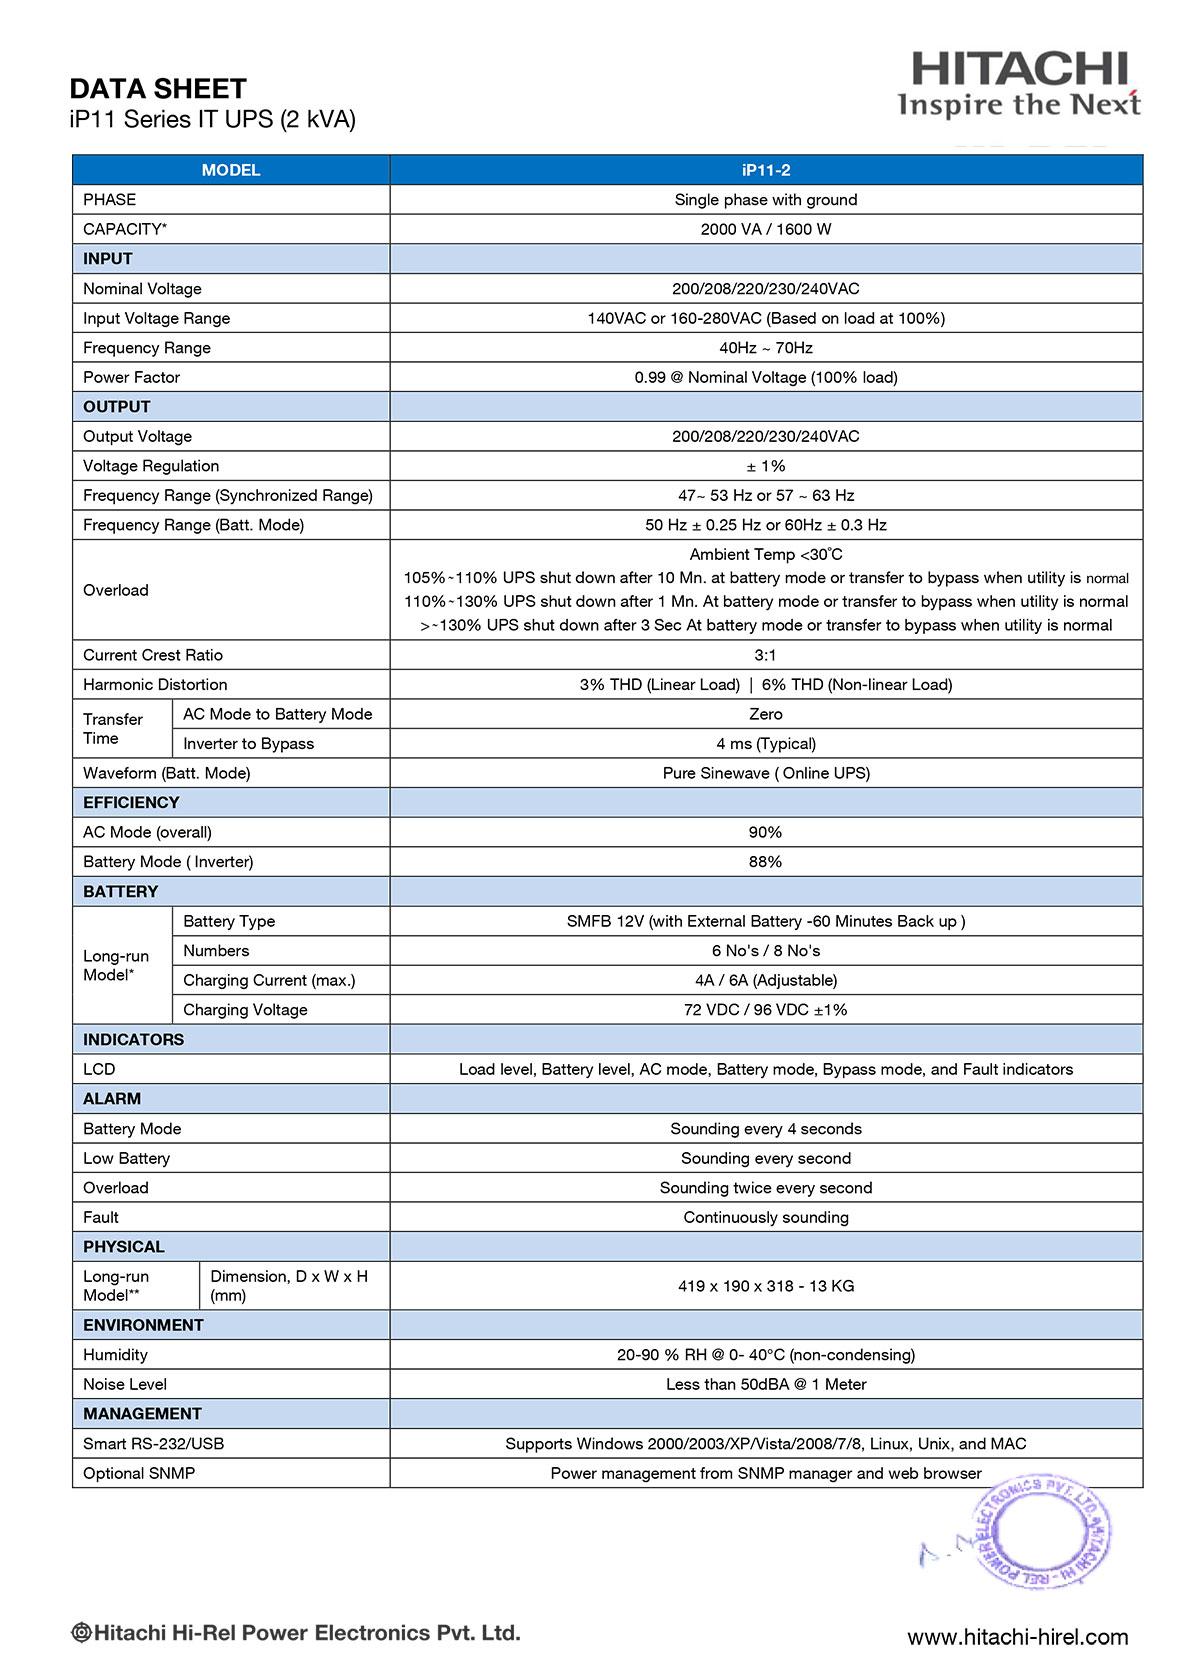 UPS Hitachi IP11-2 Datasheet